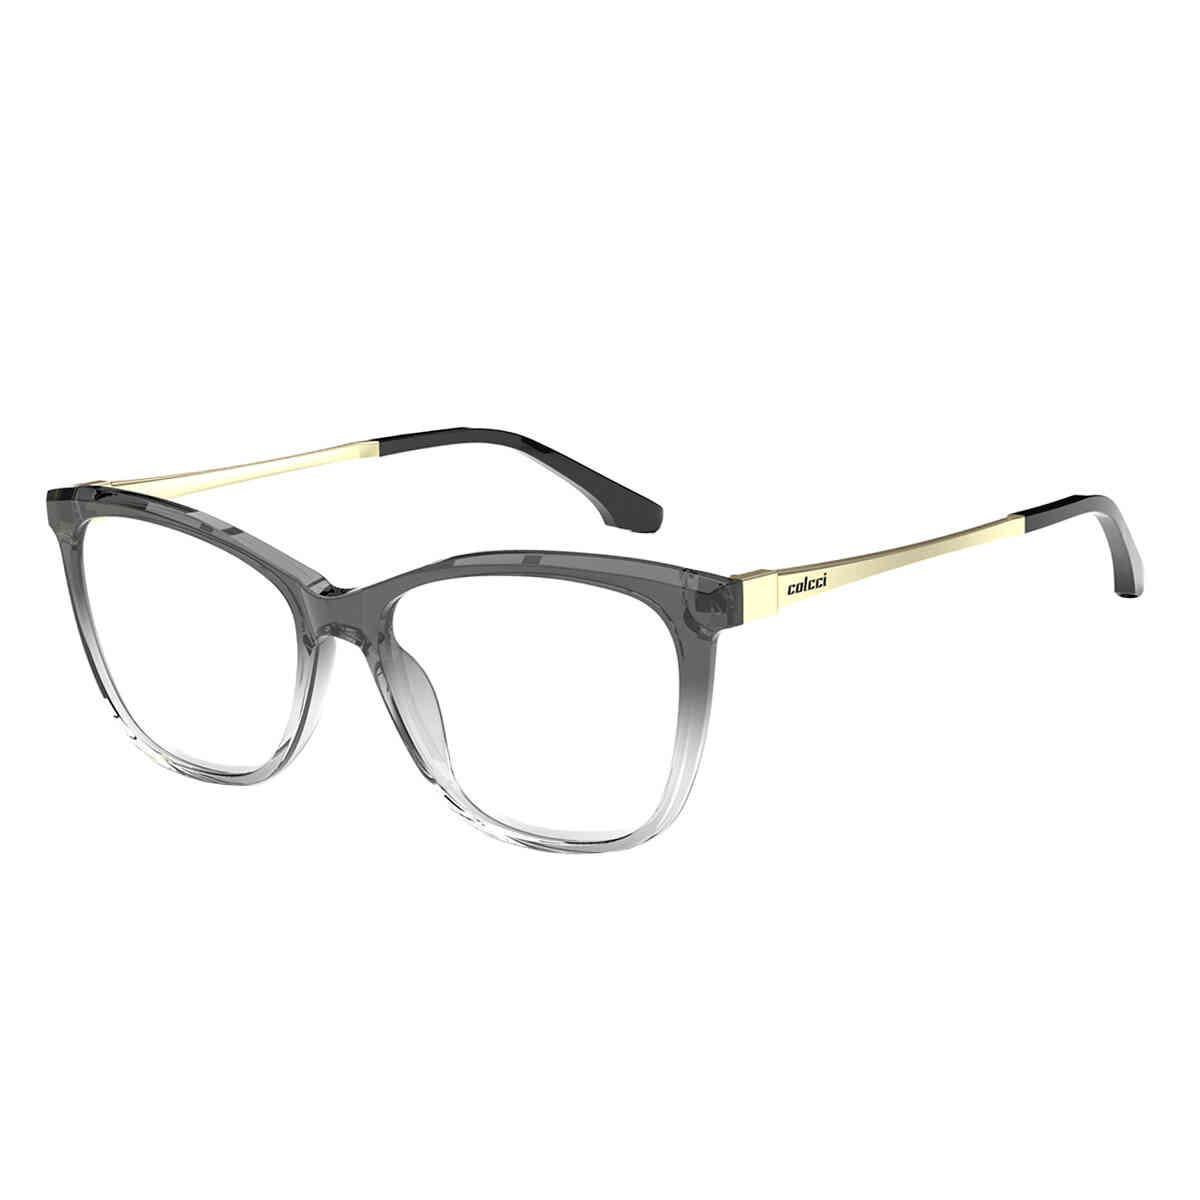 Óculos de Grau Colcci Marie 2 Feminino C6148